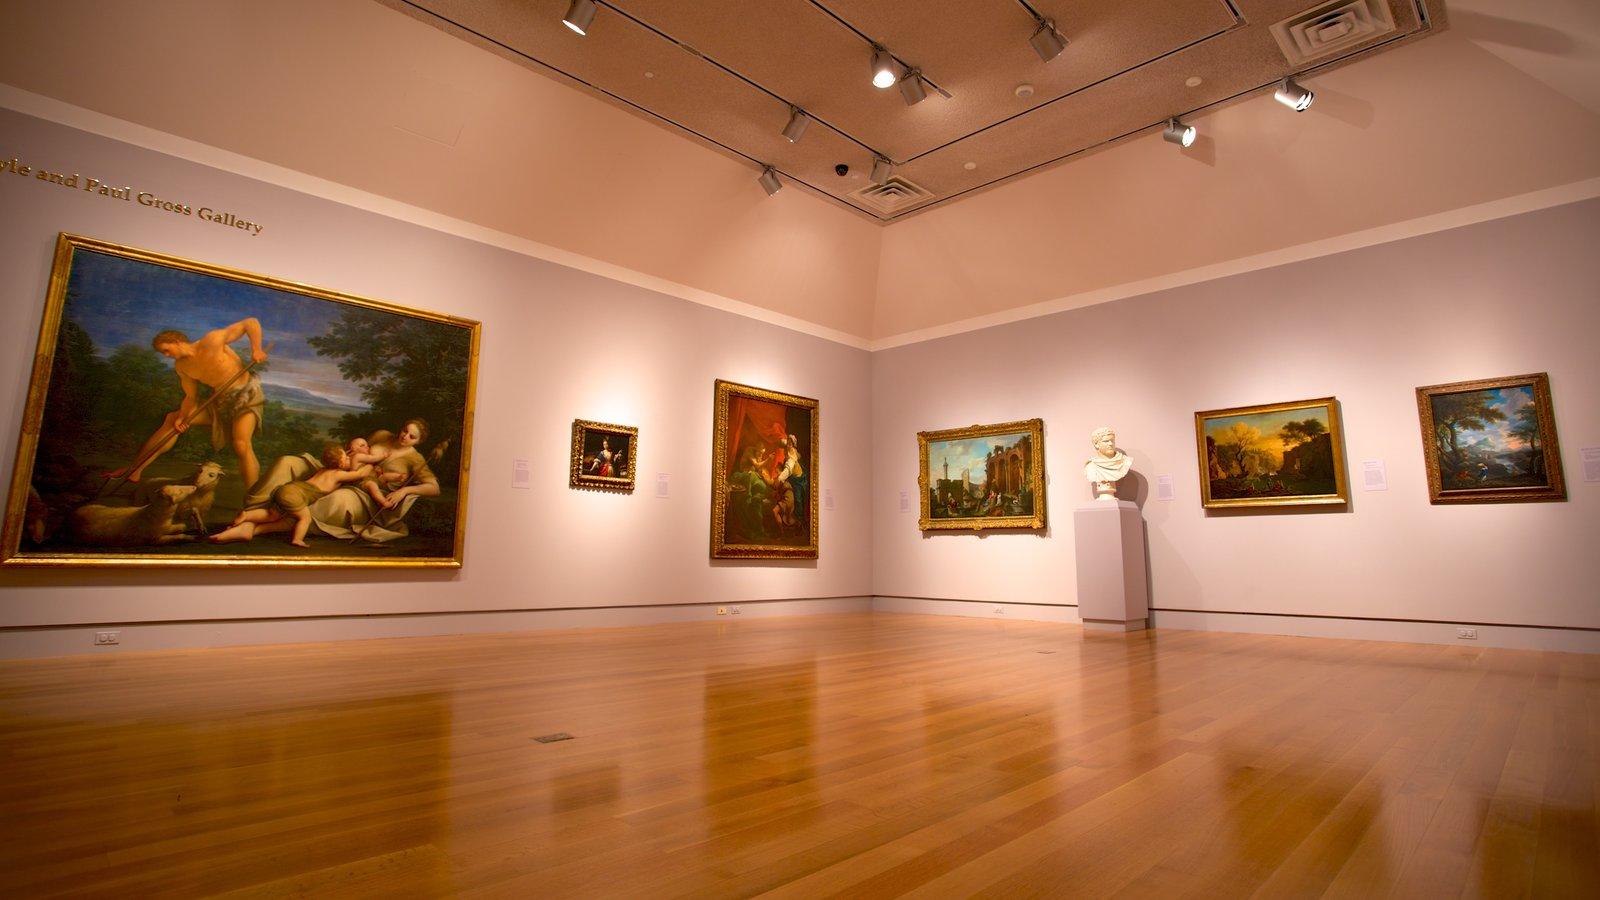 Norton Museum of Art featuring art and interior views